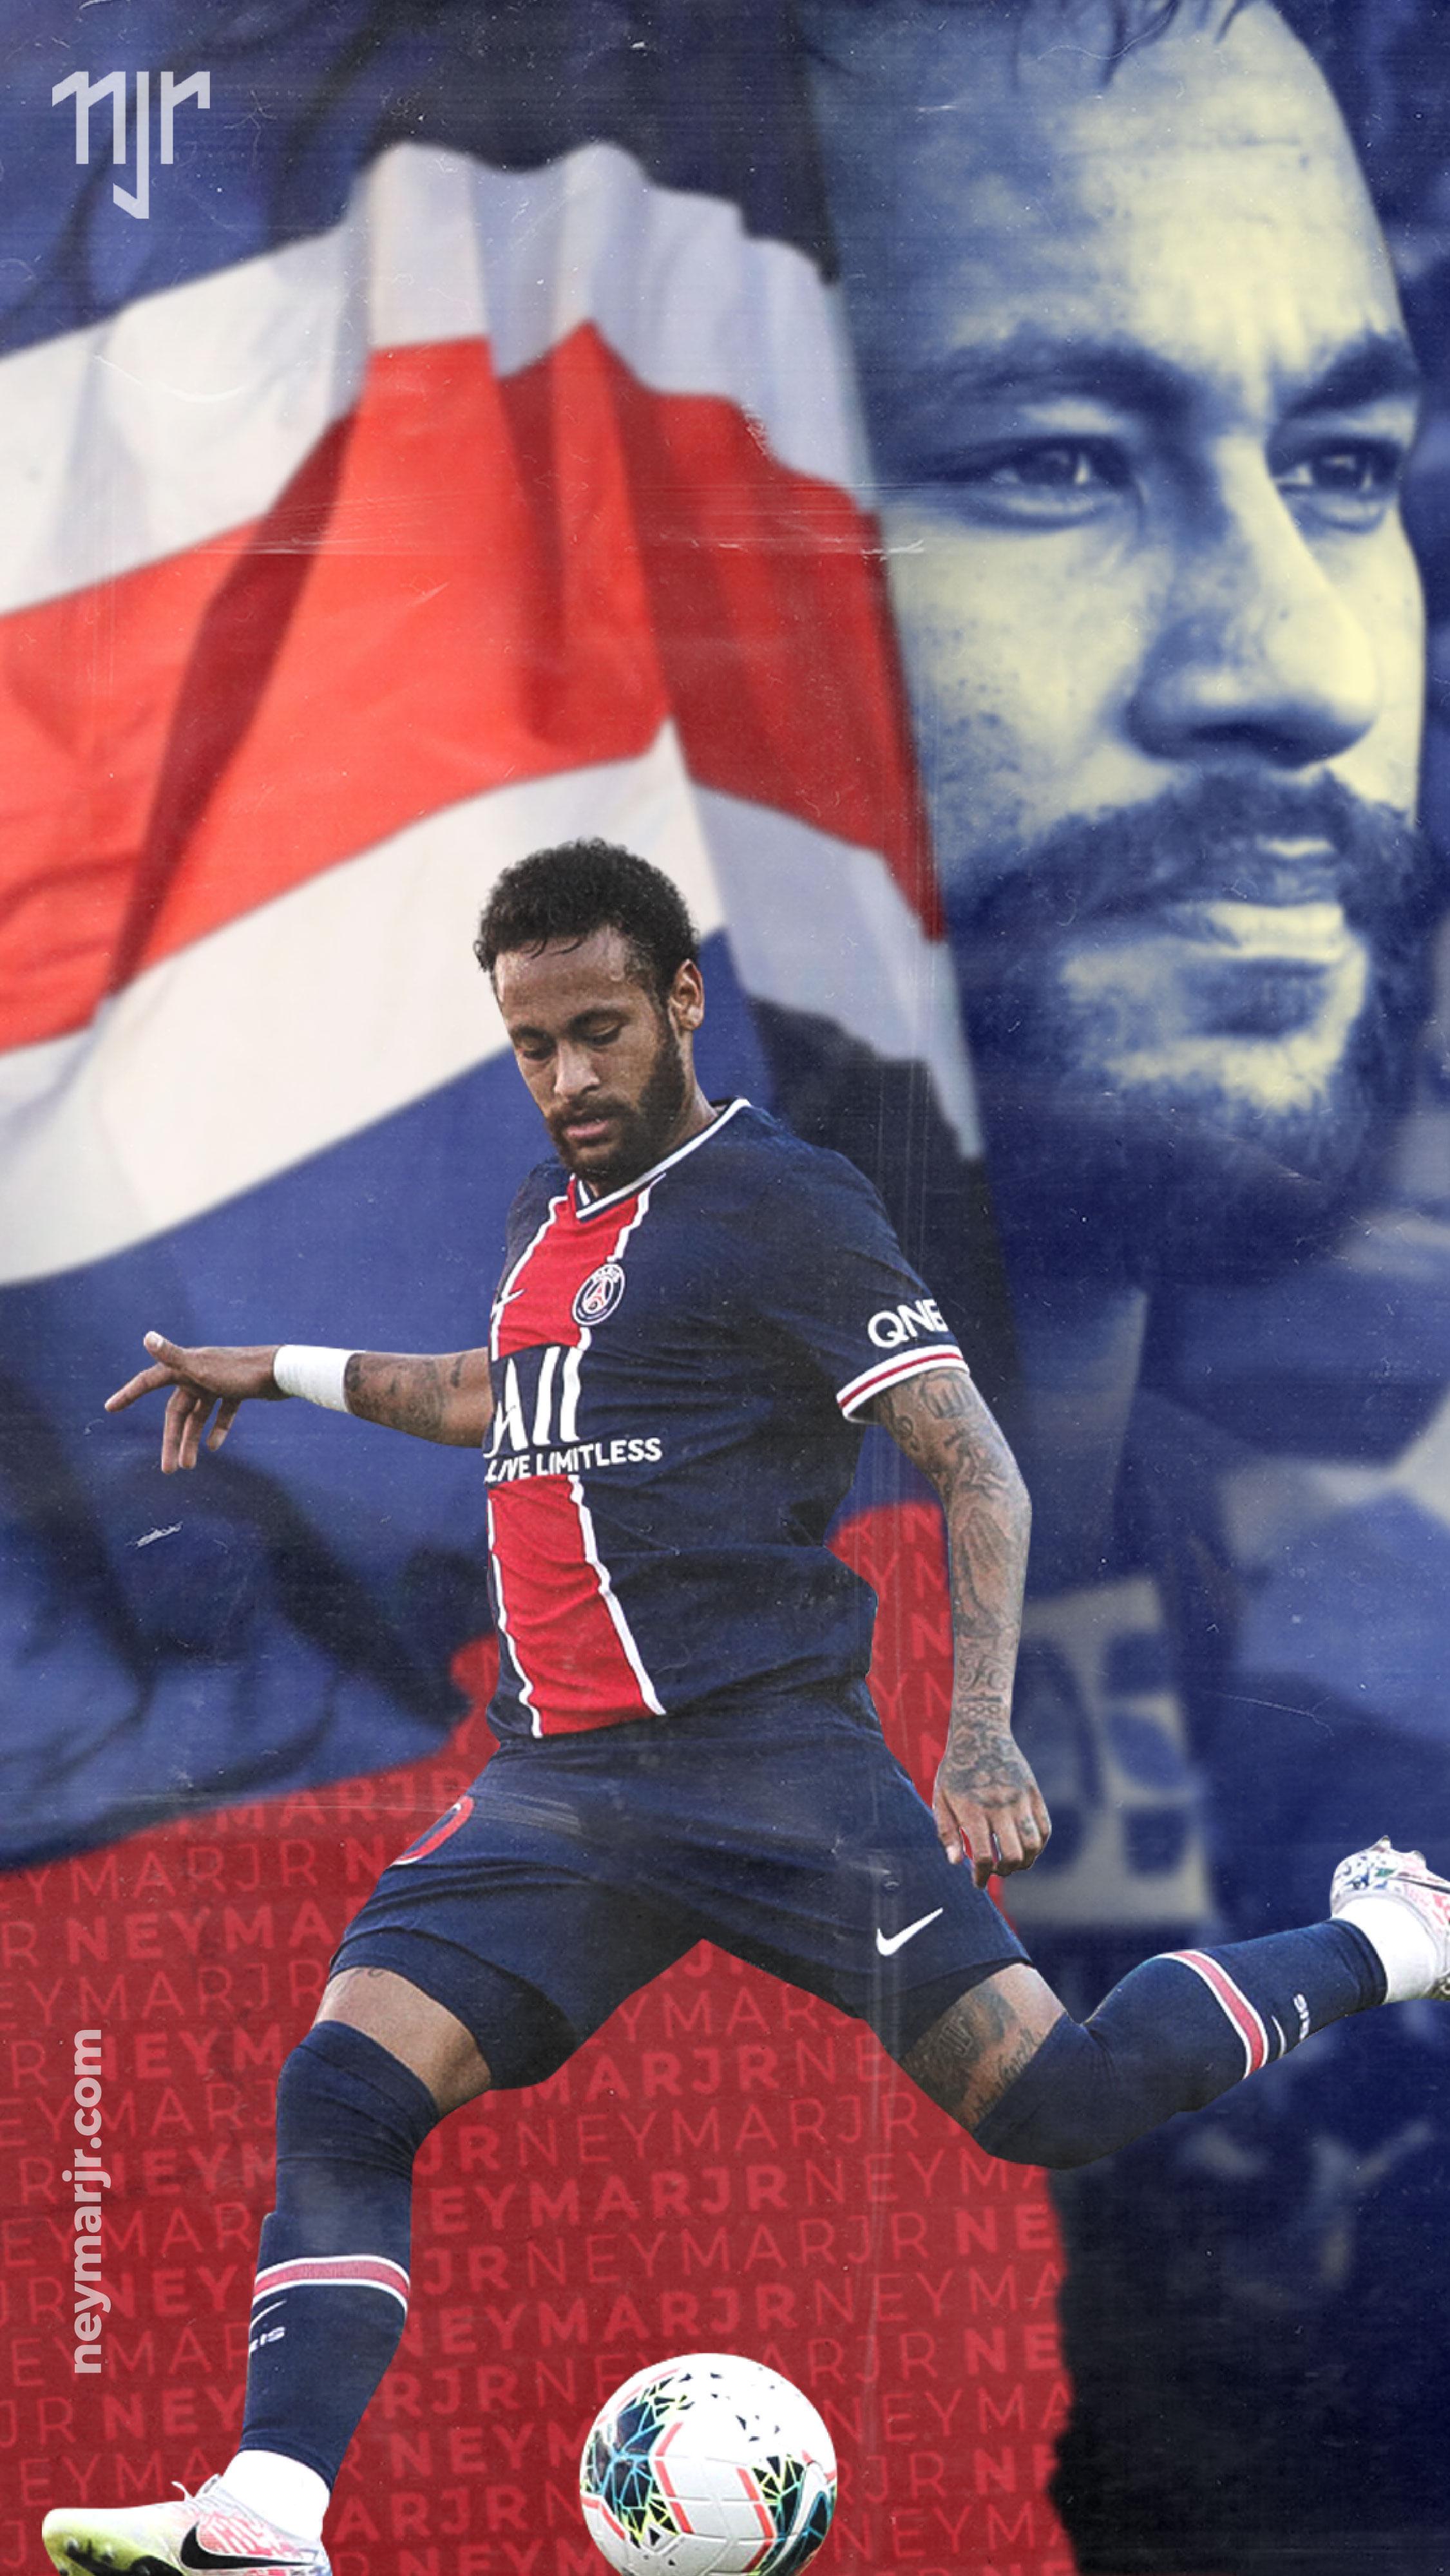 Neymar Jr Wallpaper Neymar Jr